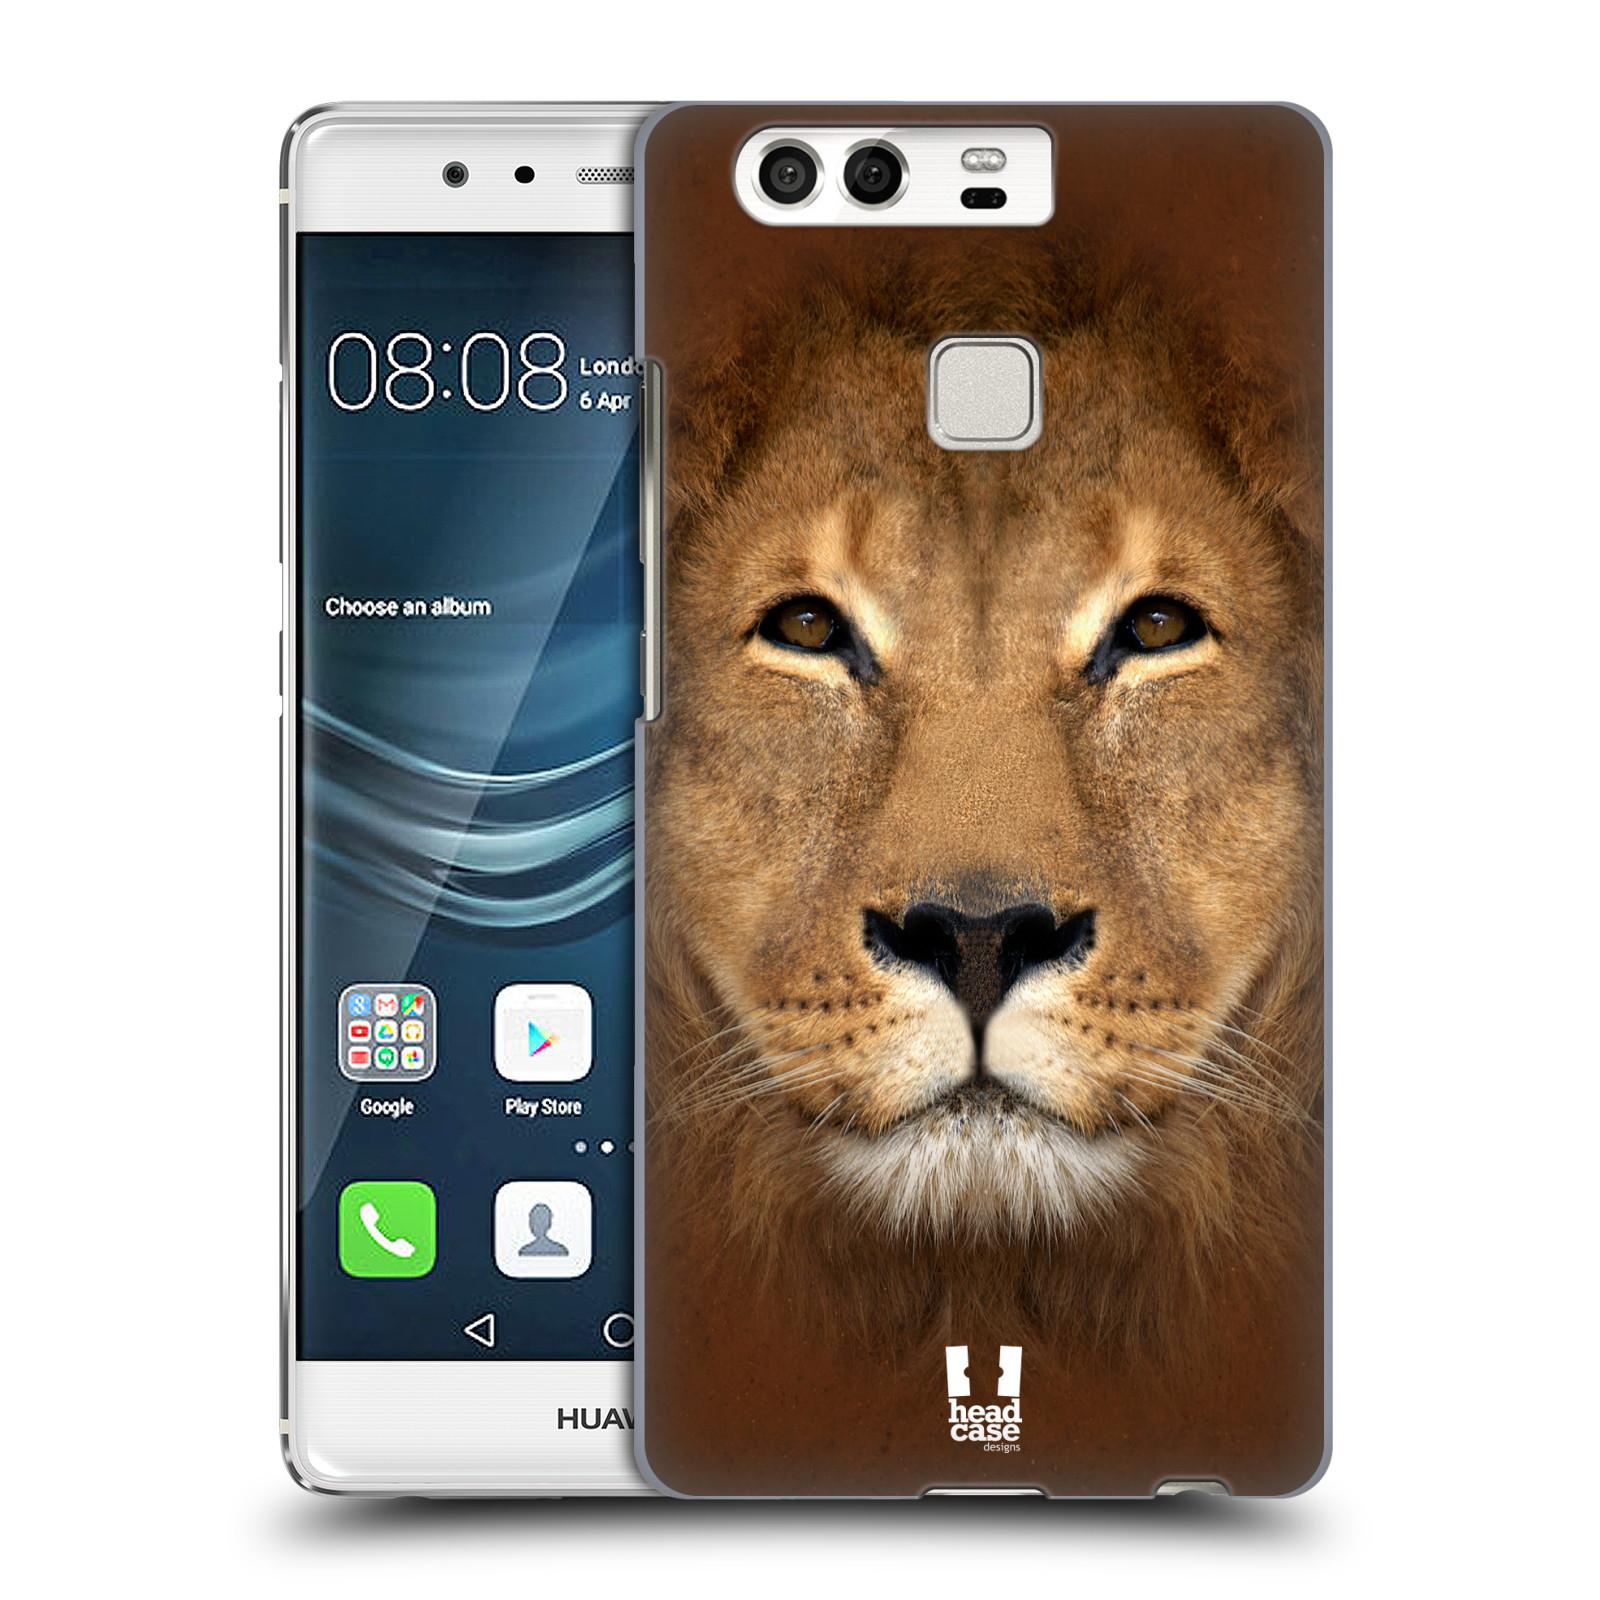 HEAD CASE plastový obal na mobil Huawei P9 / P9 DUAL SIM vzor Zvířecí tváře 2 Lev